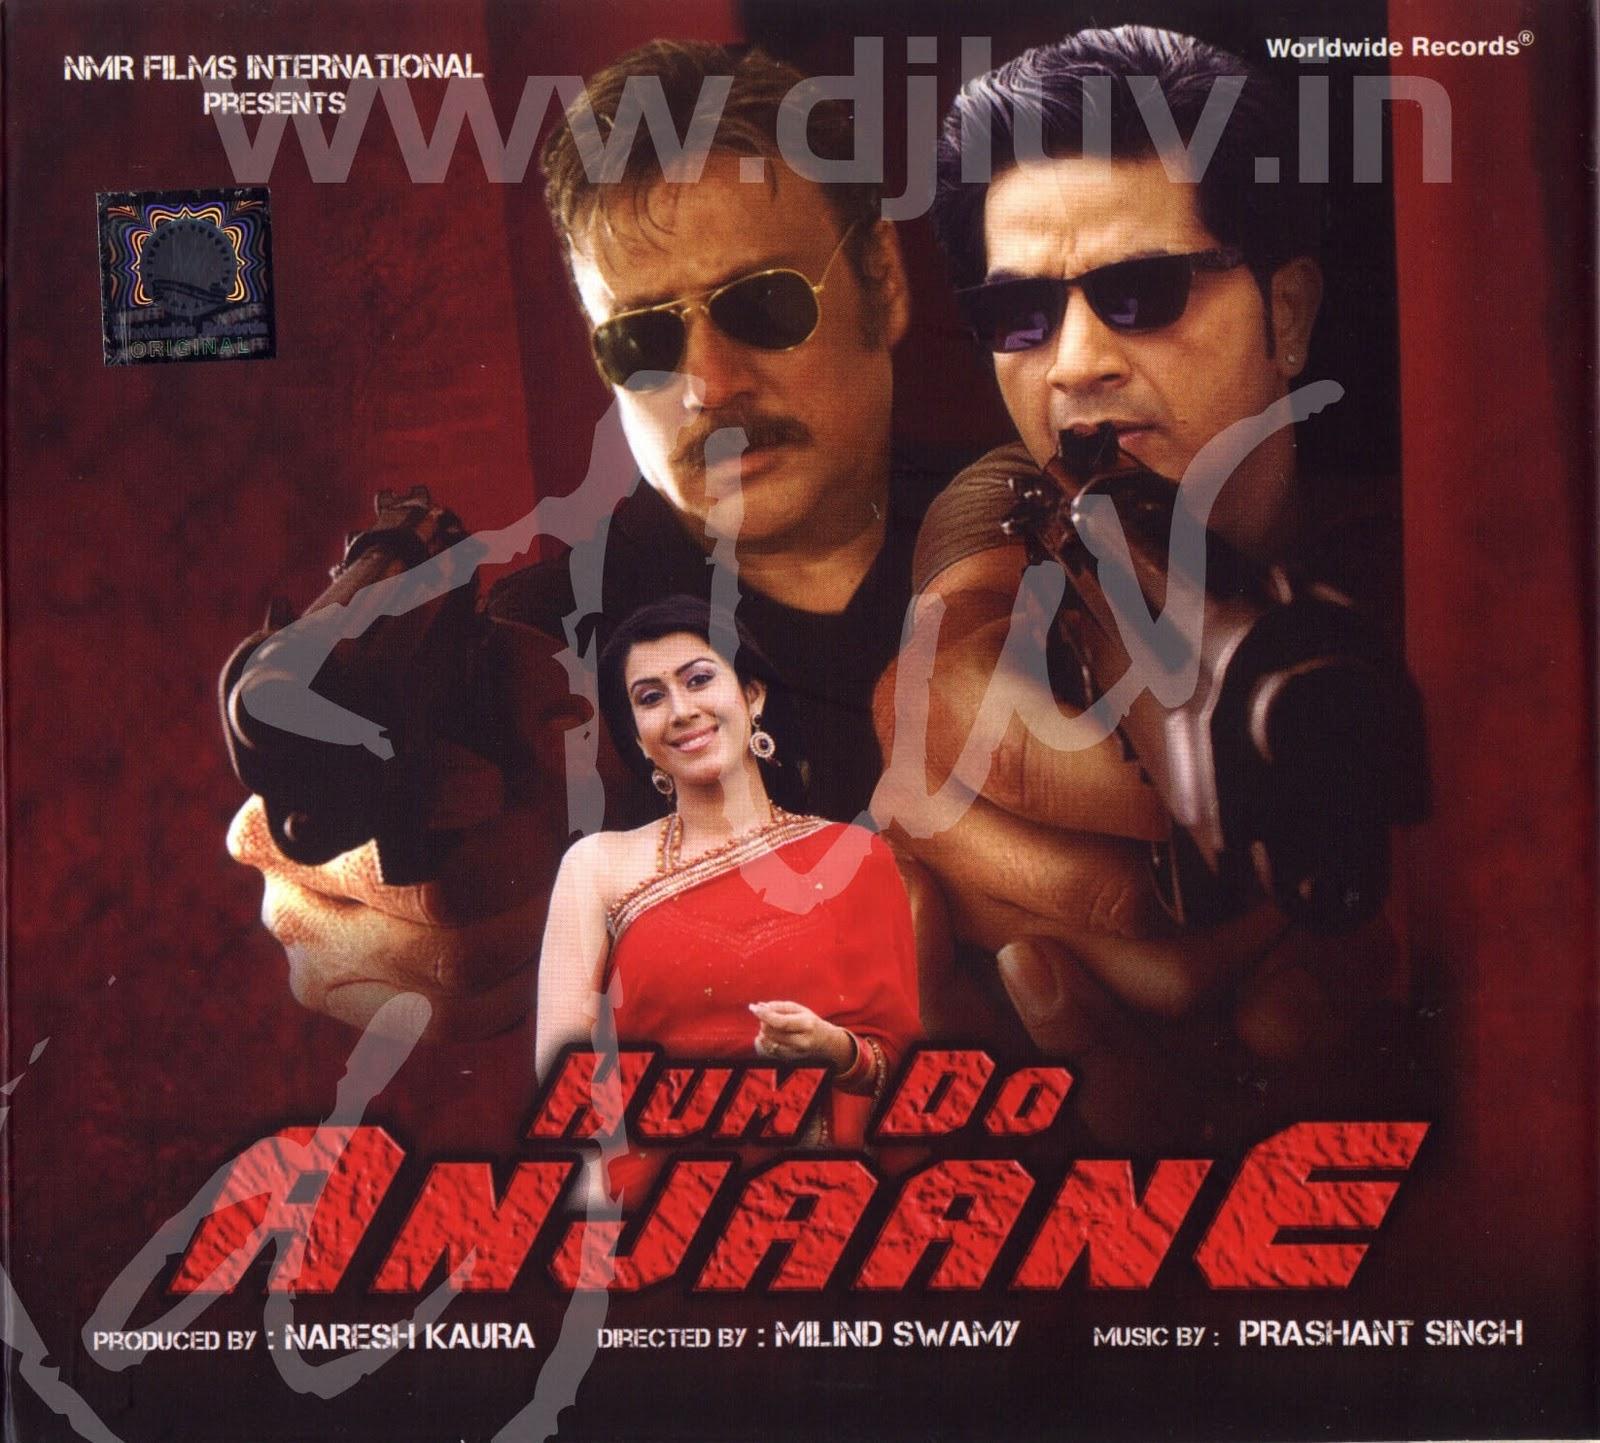 Hum Saath Saath Hain Hindi Movie Mp3 Songs Download